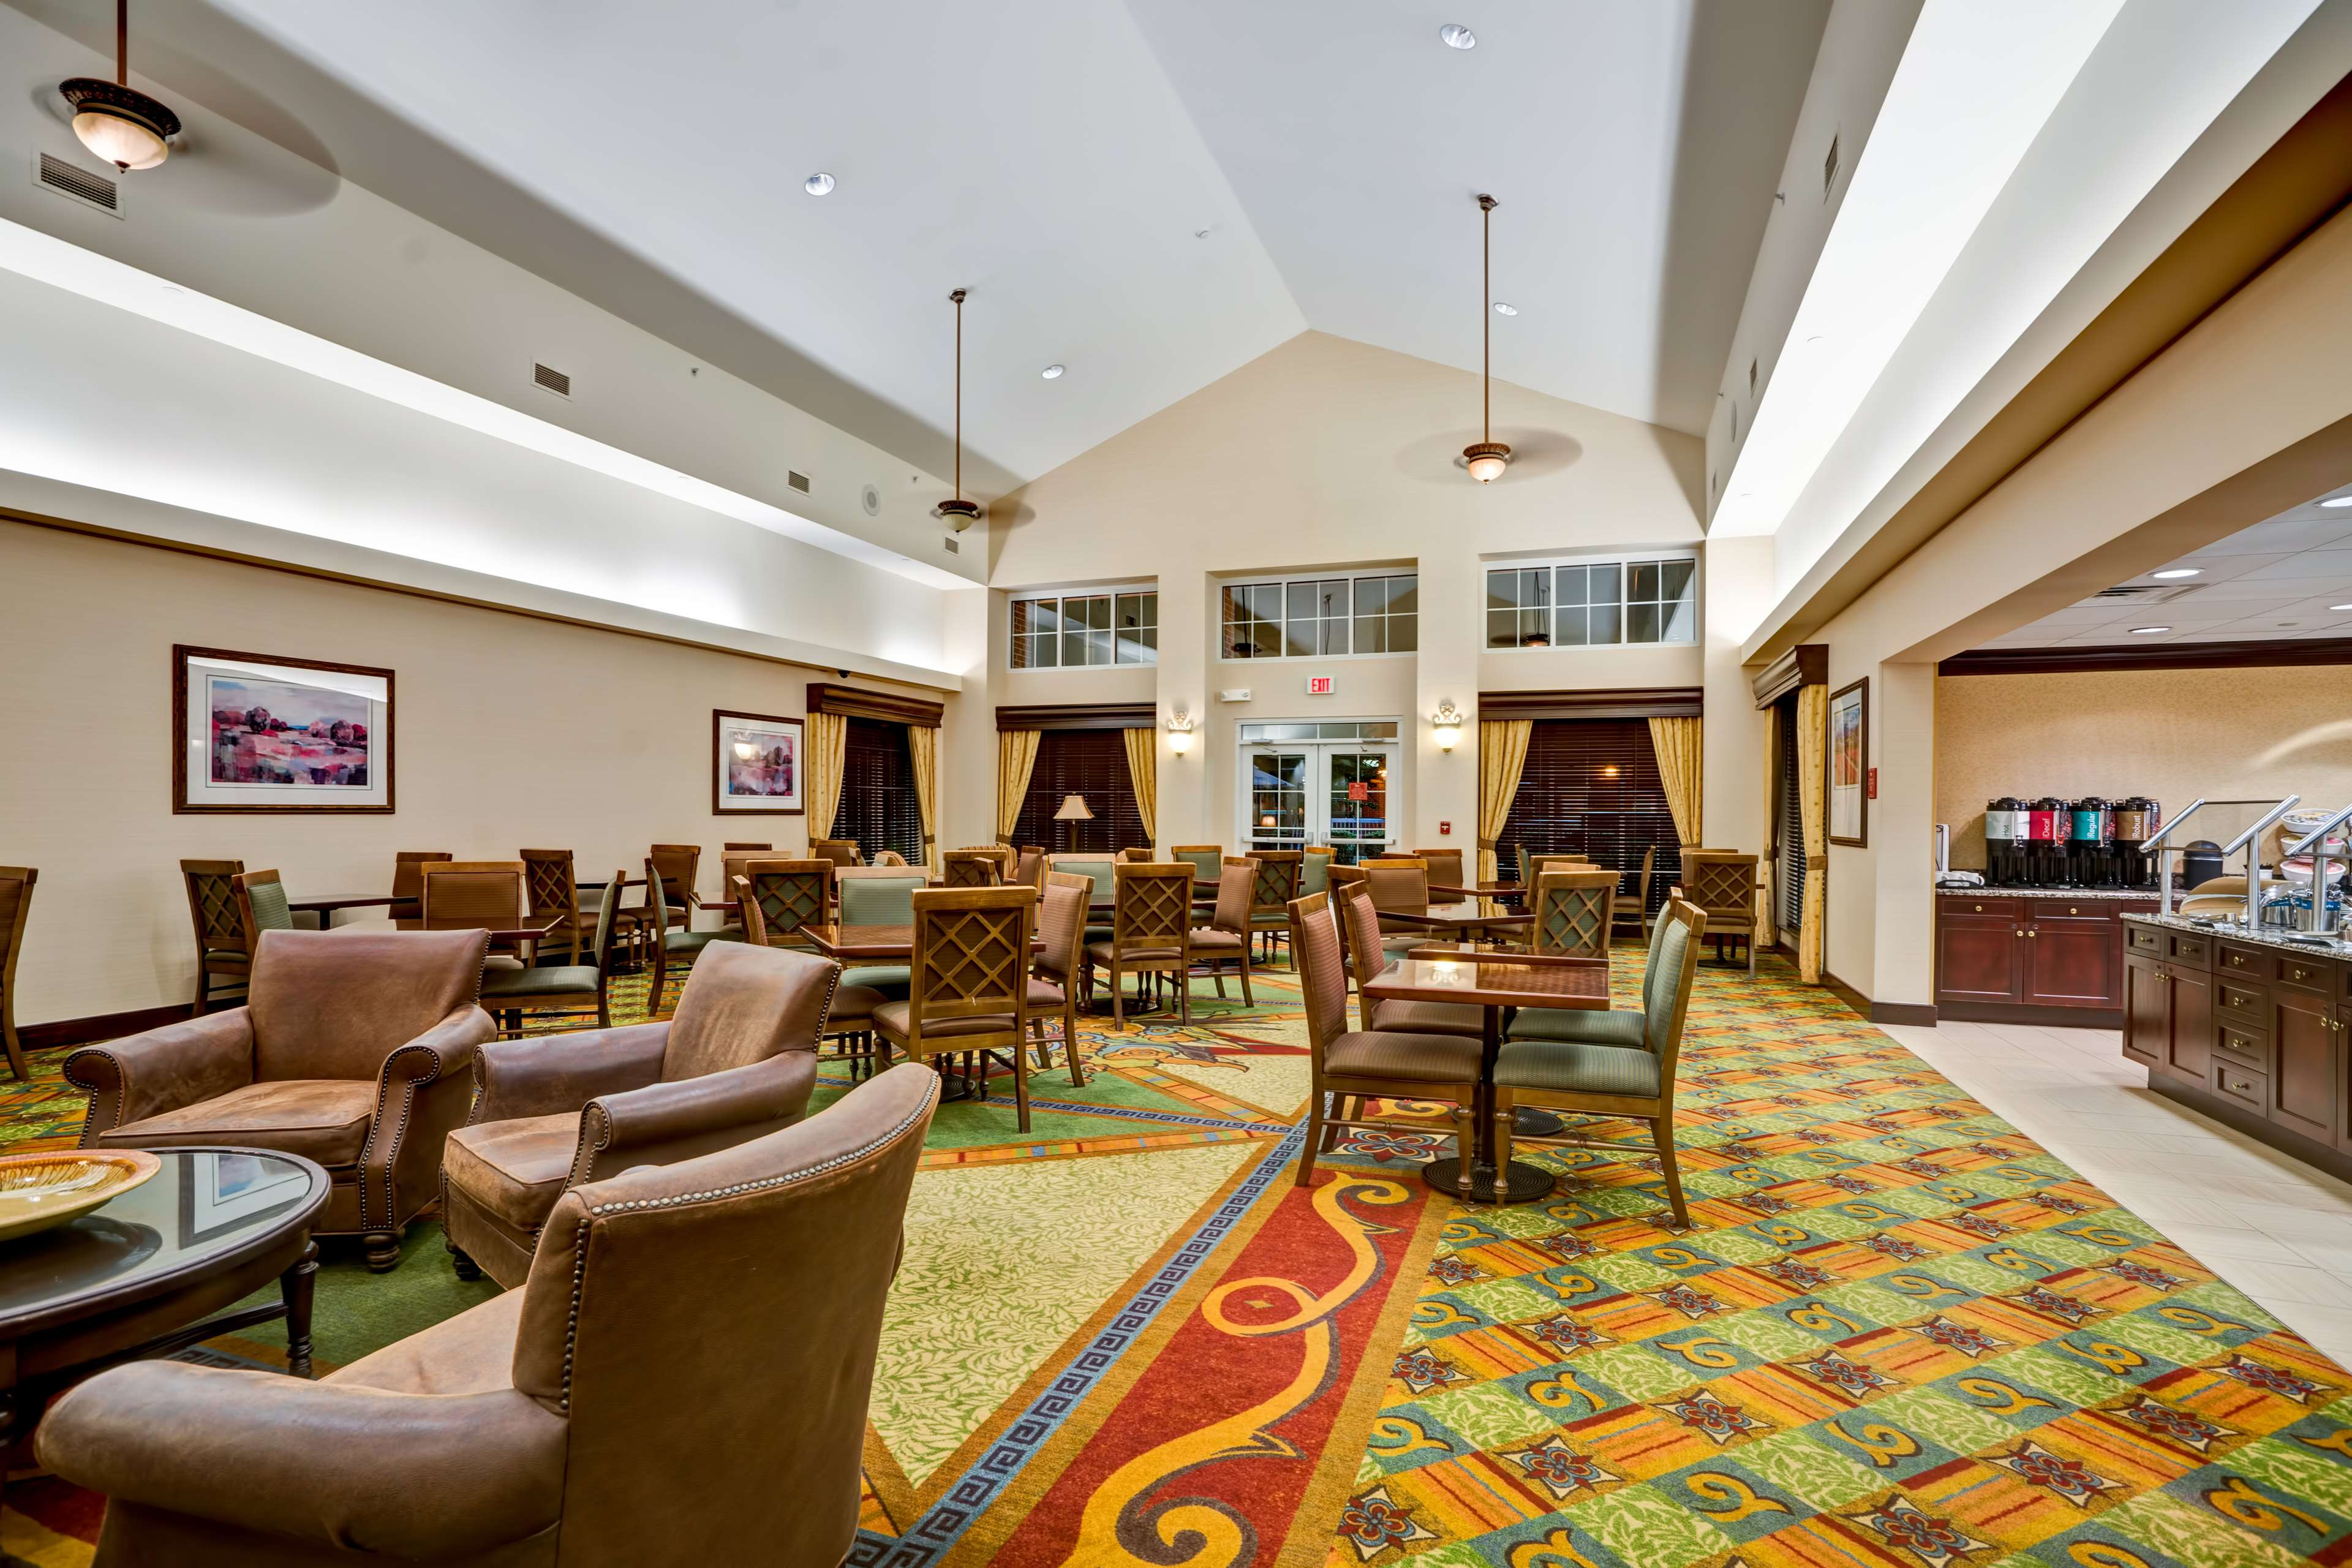 Homewood Suites by Hilton Fredericksburg image 9